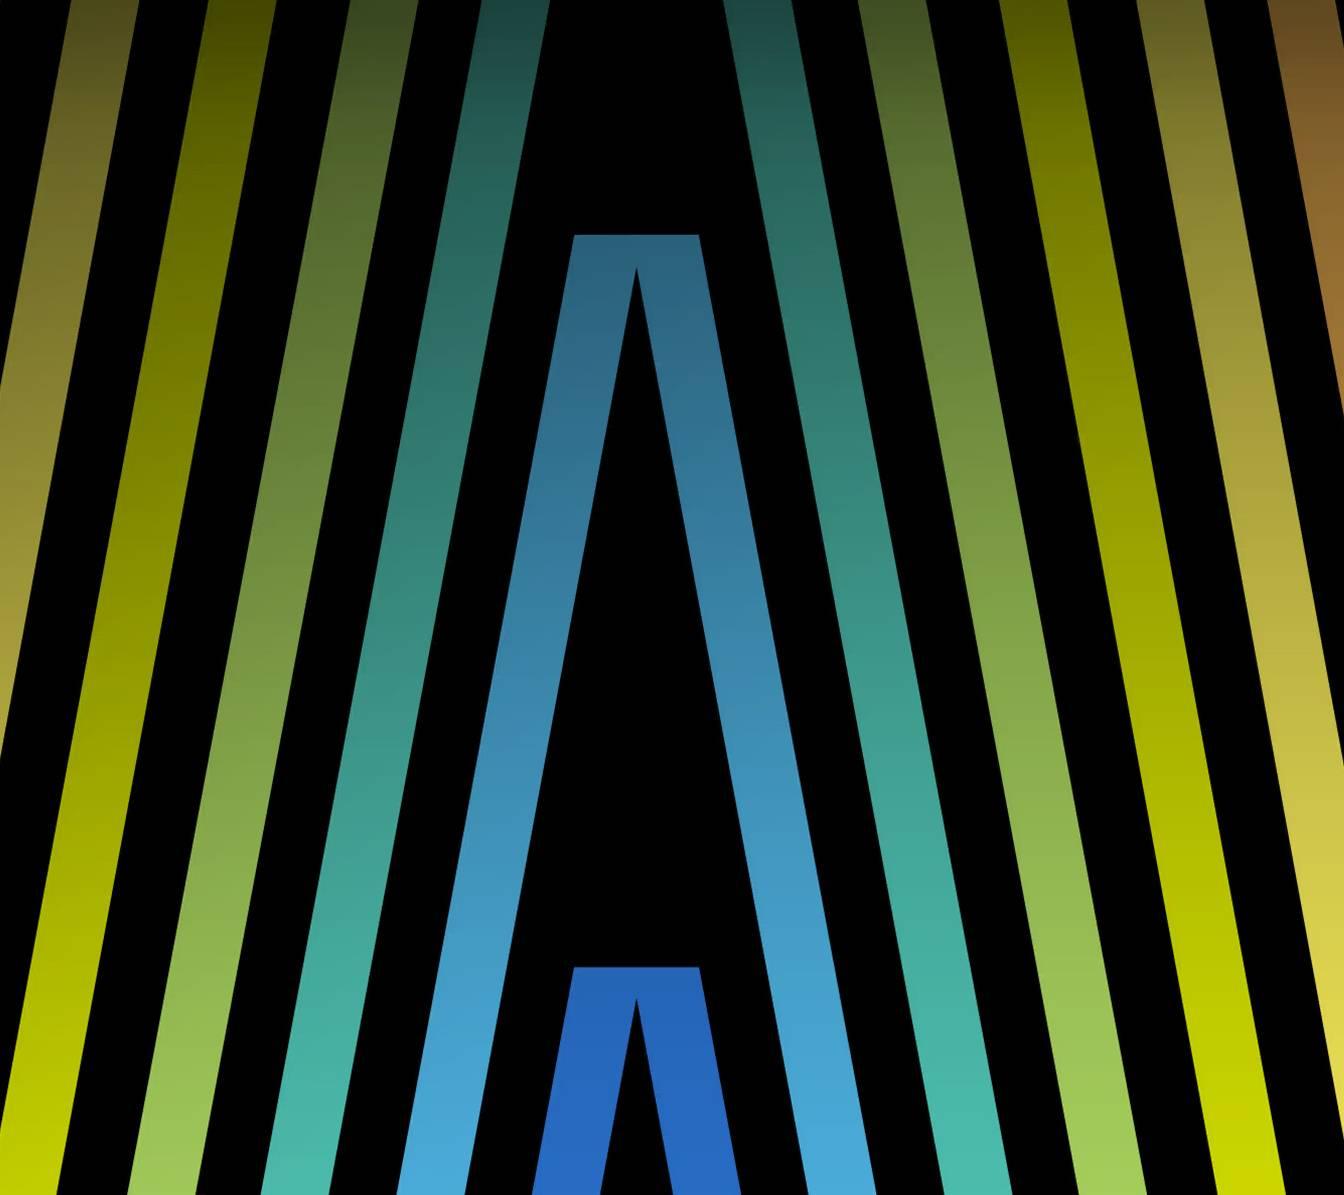 Samsung Galaxy A7 Wallpaper By Albinn10 13 Free On Zedge